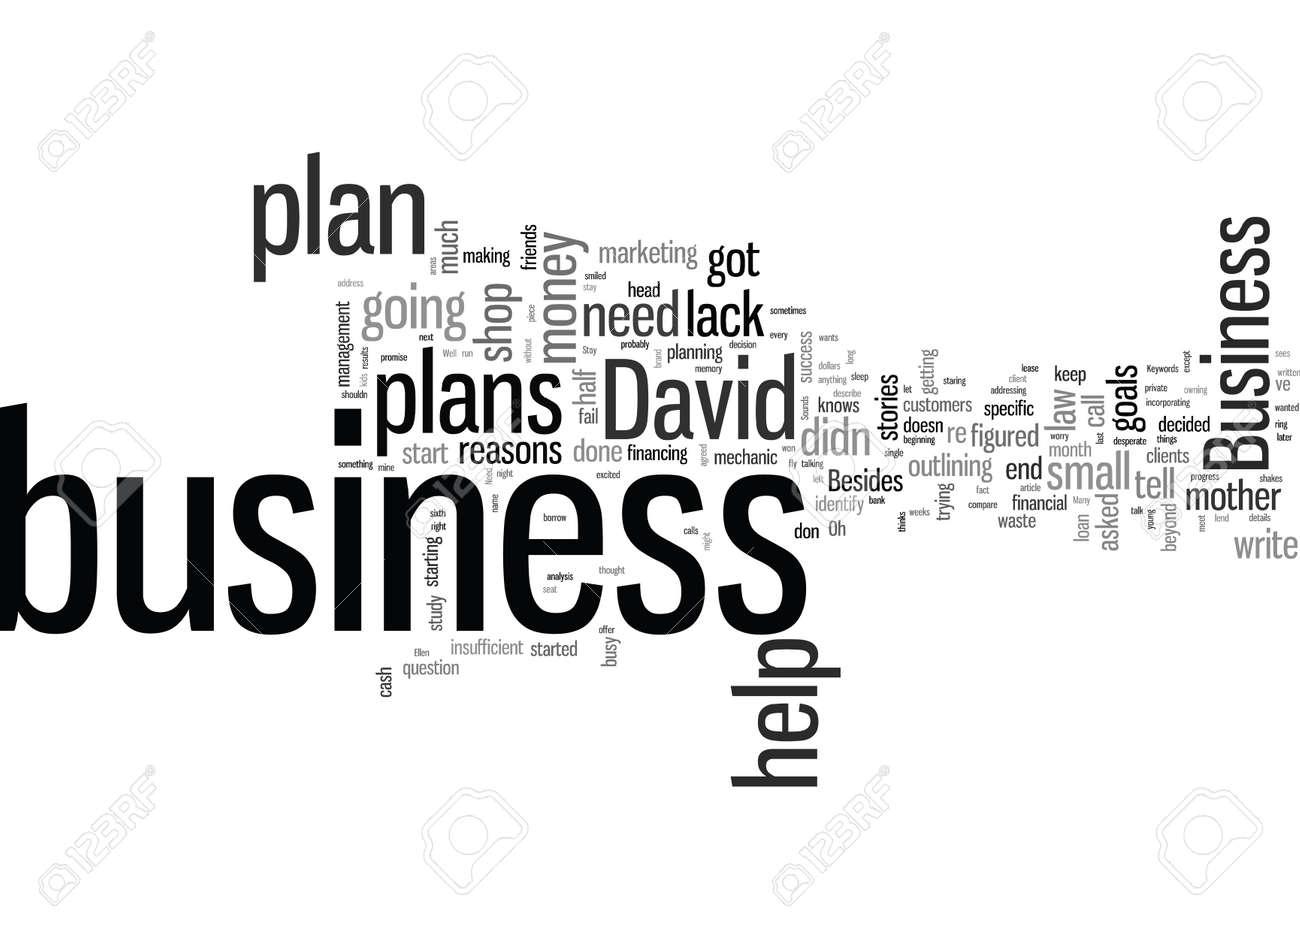 I Don t Need a Business PlanDo I - 132373276